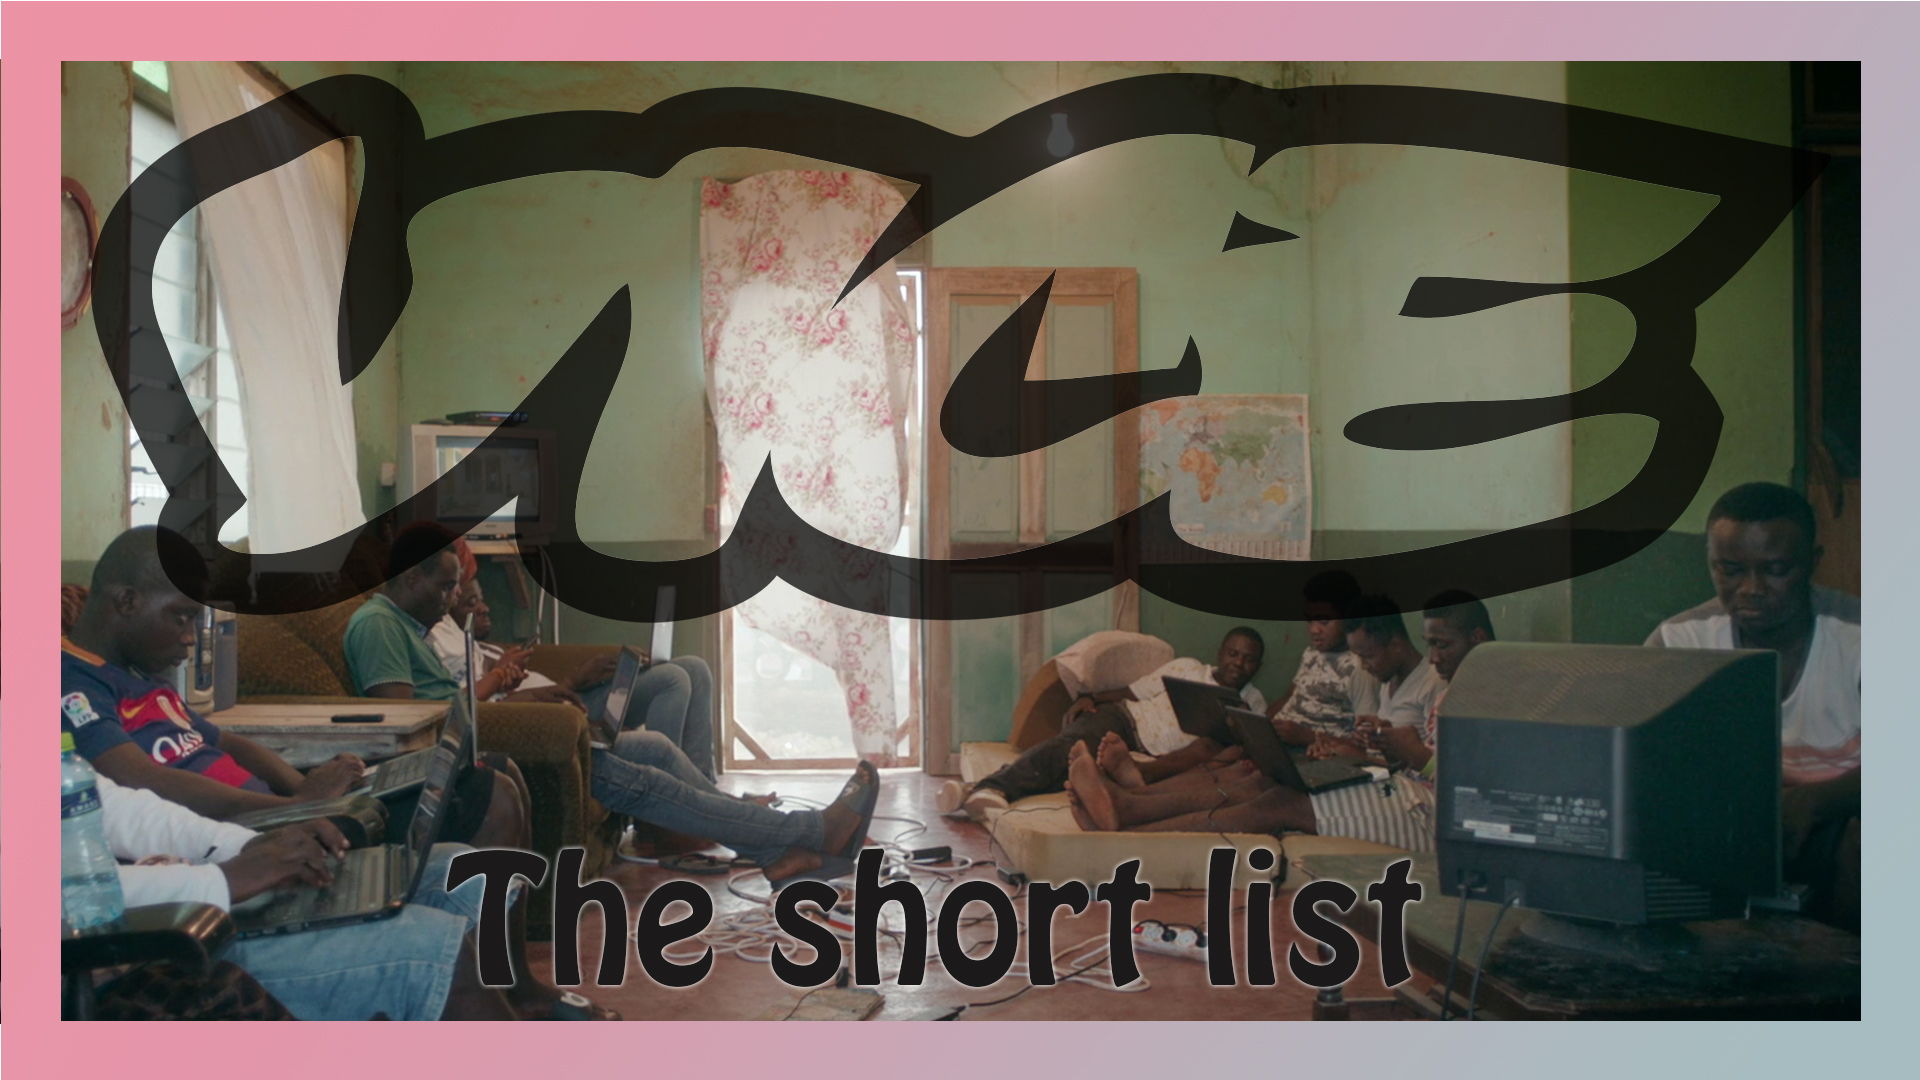 Vice's The Short List Documentary — 9 free documentaries